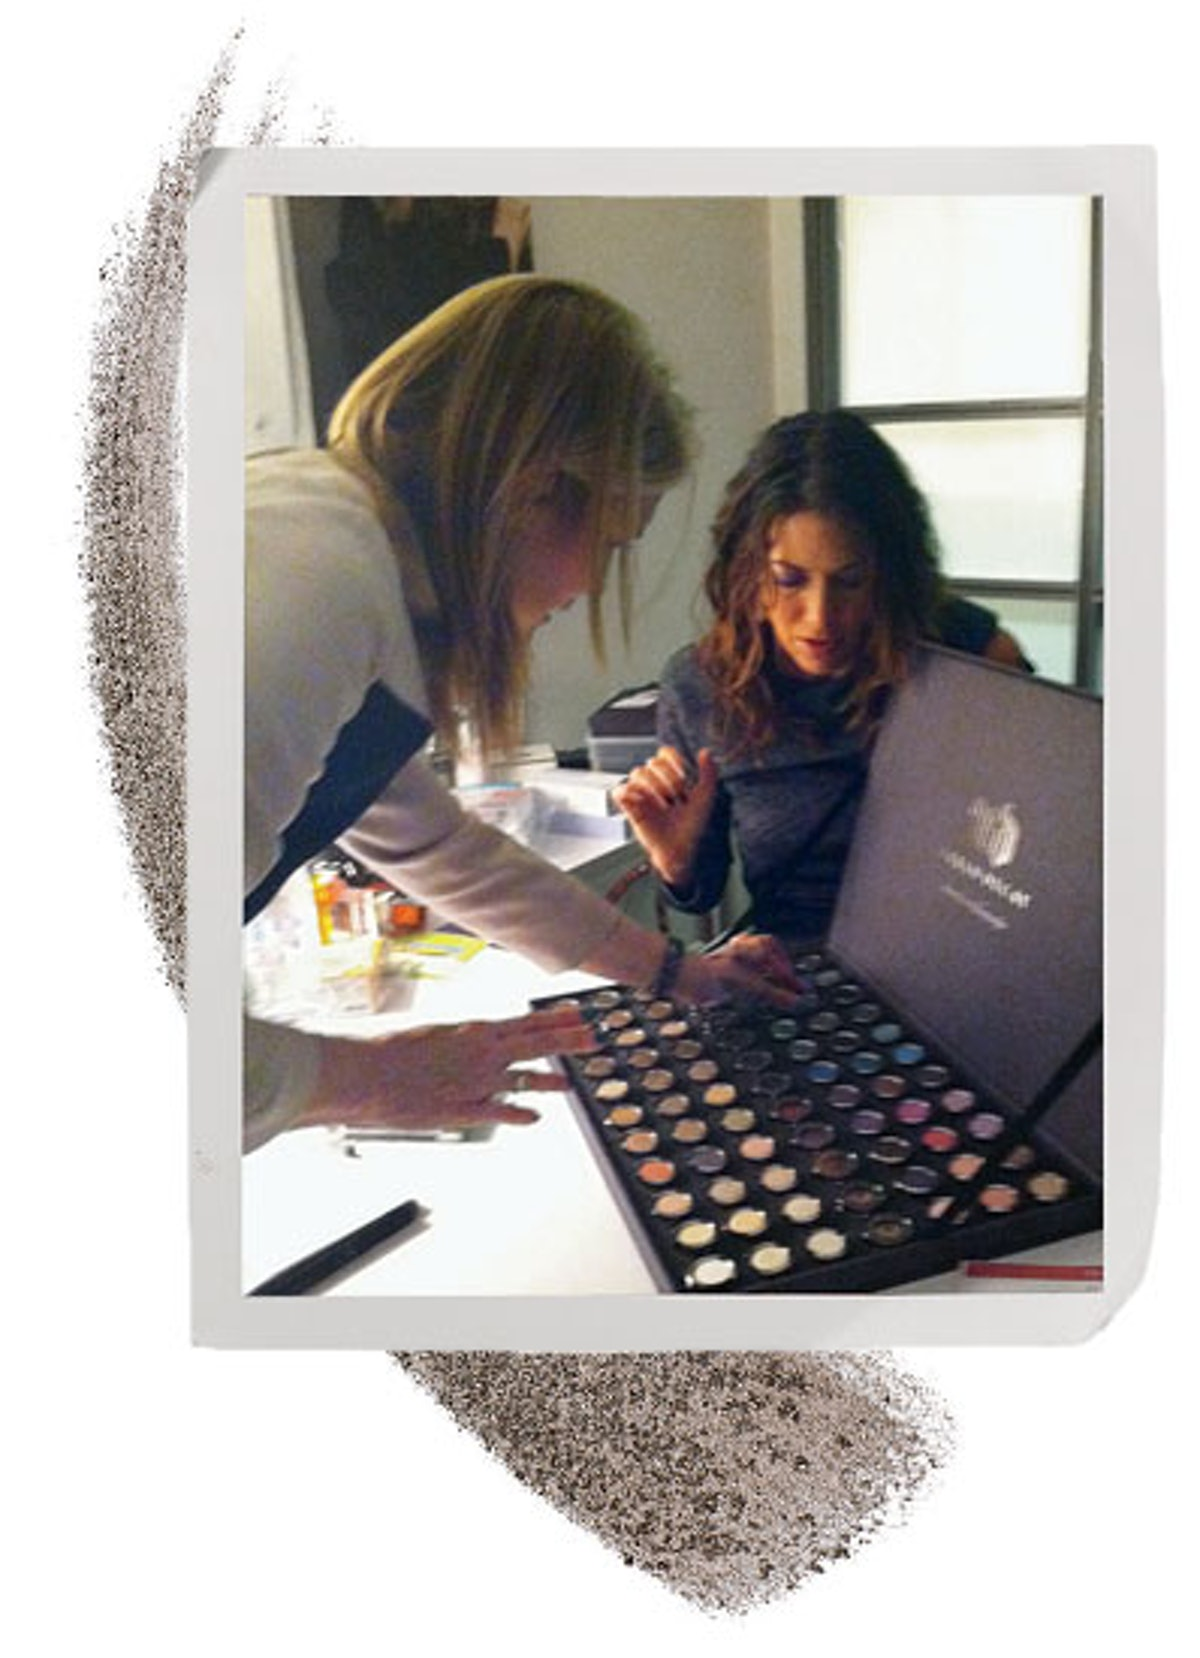 bess-janes-addiction-june-2012-01-v.jpg